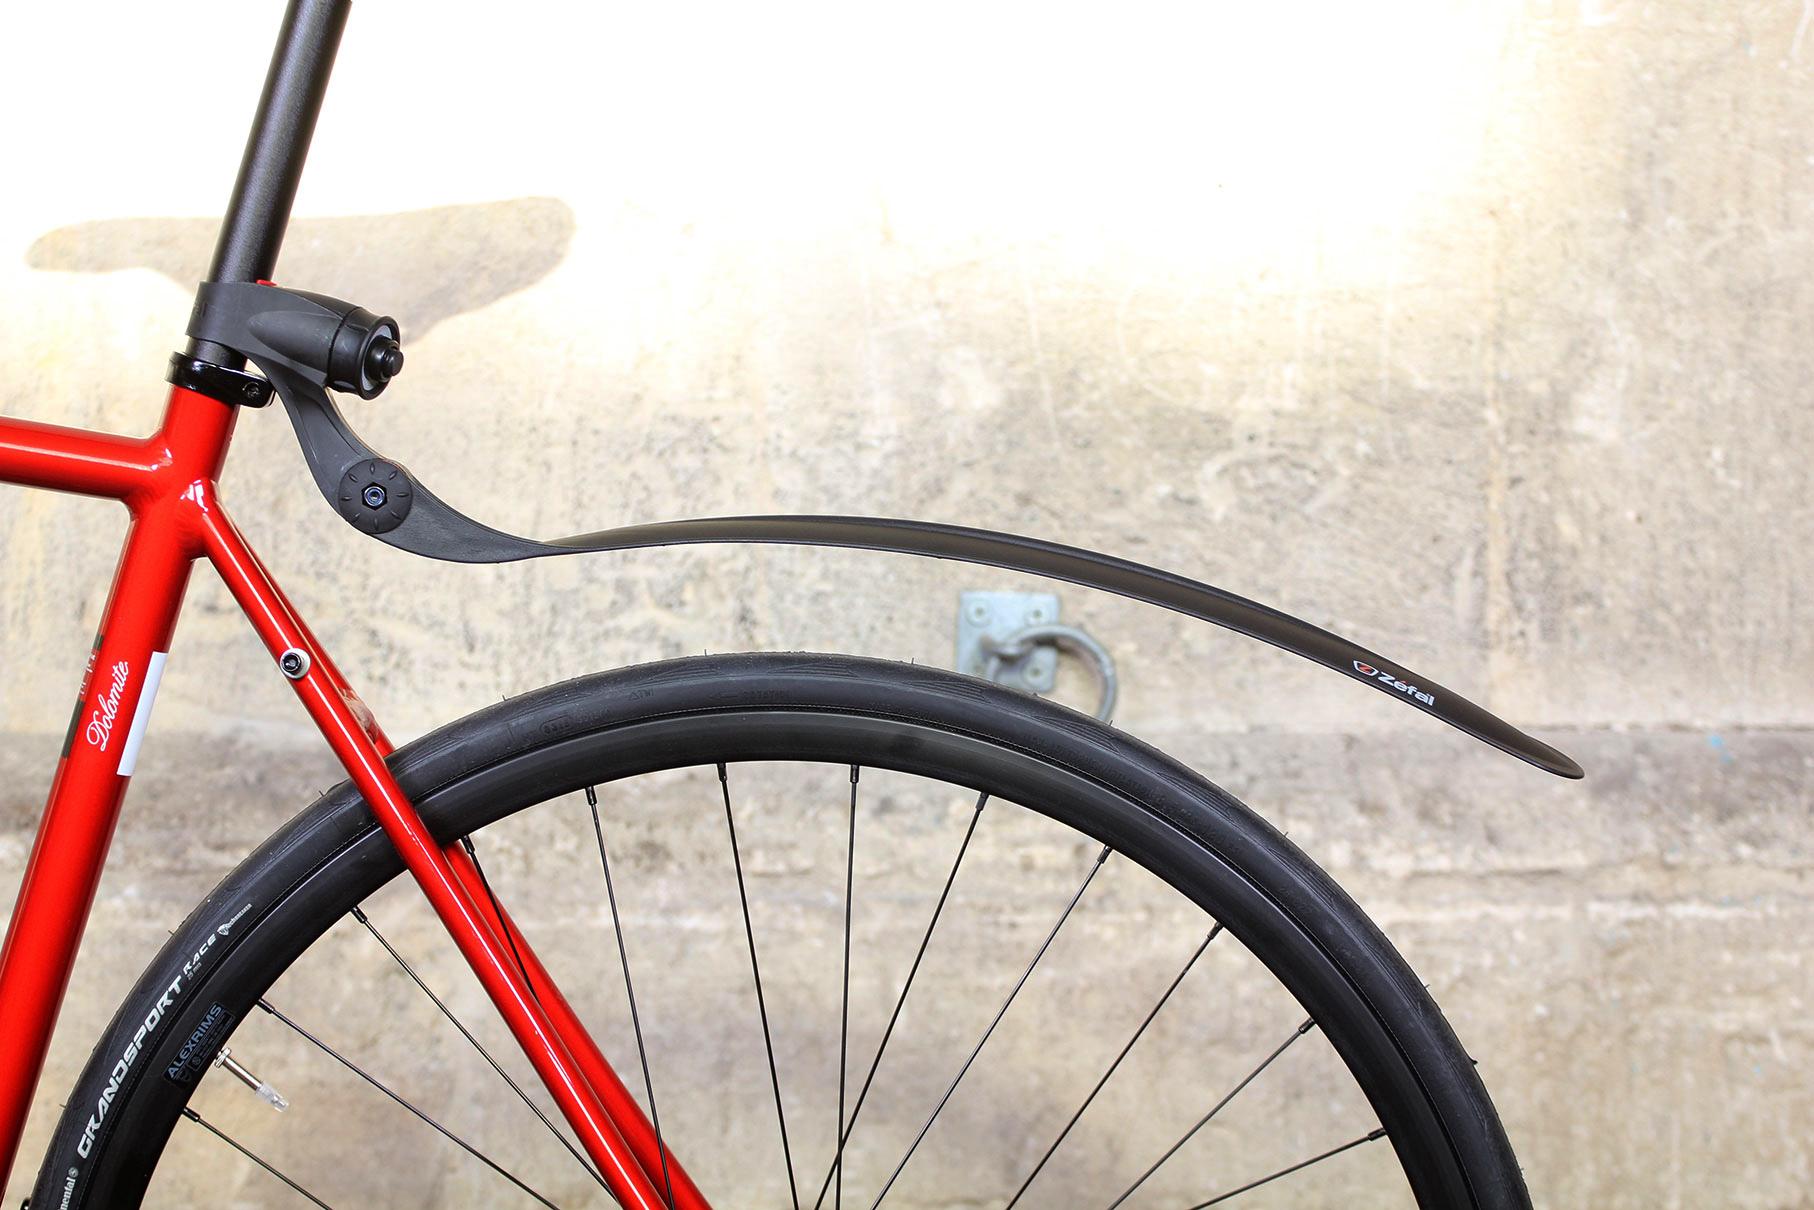 ZEFAL SWAN /& CROOZER ROAD BIKE BICYCLE CYCLE FRONT REAR MUDGUARD SET